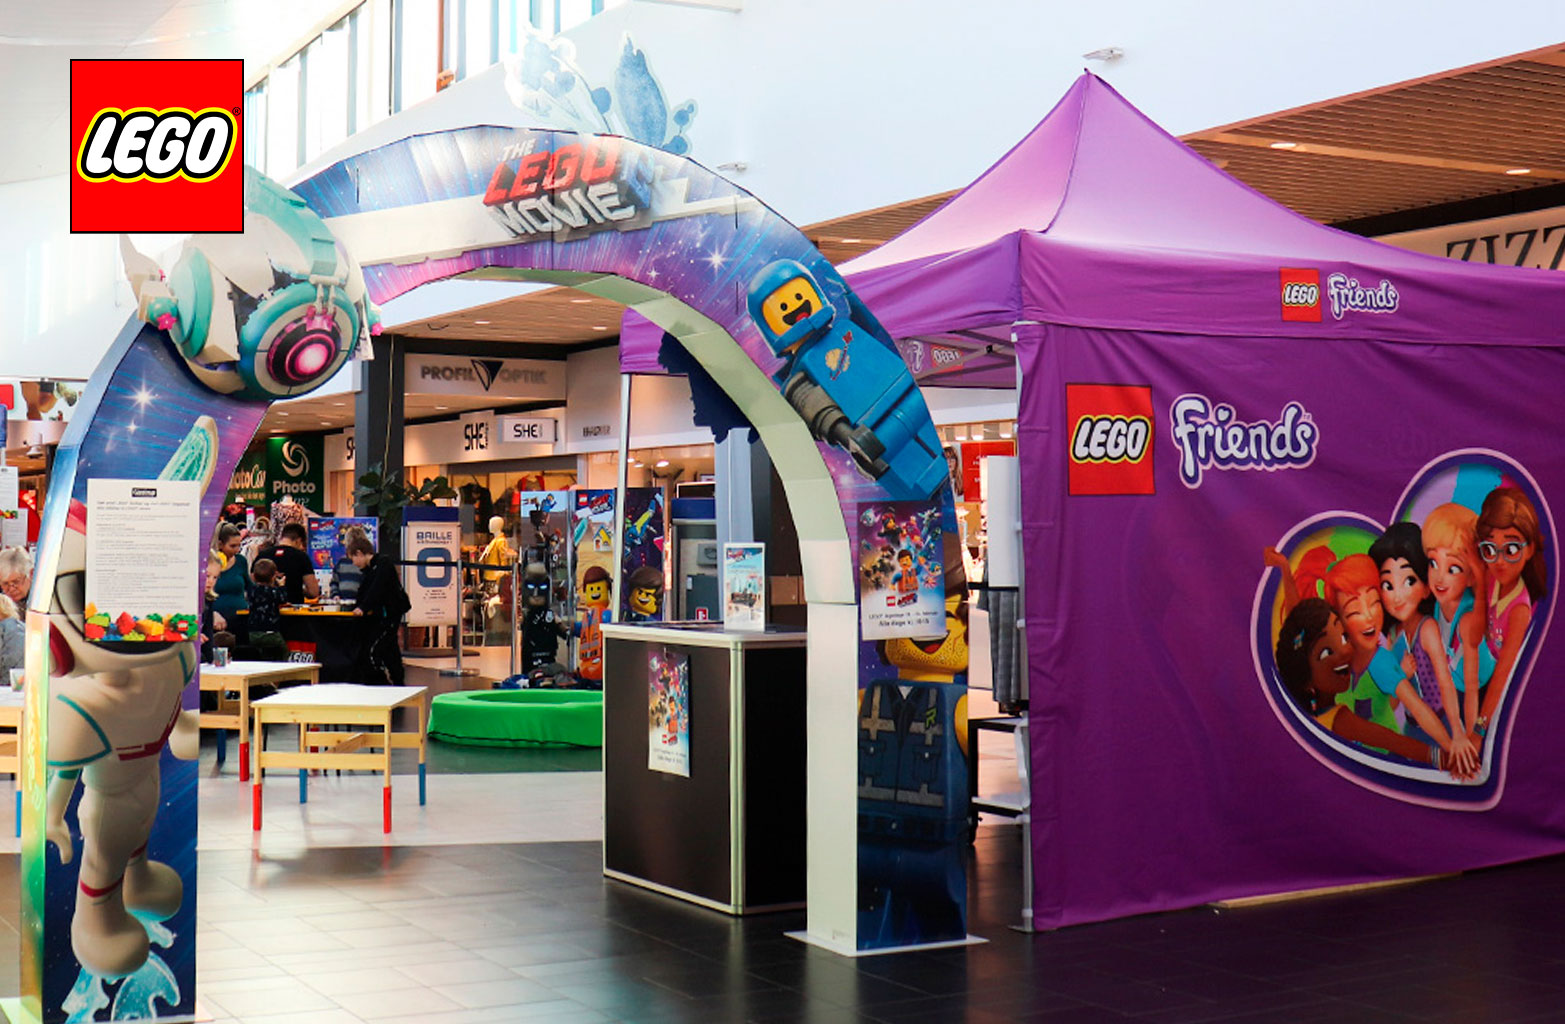 LEGO centerevent